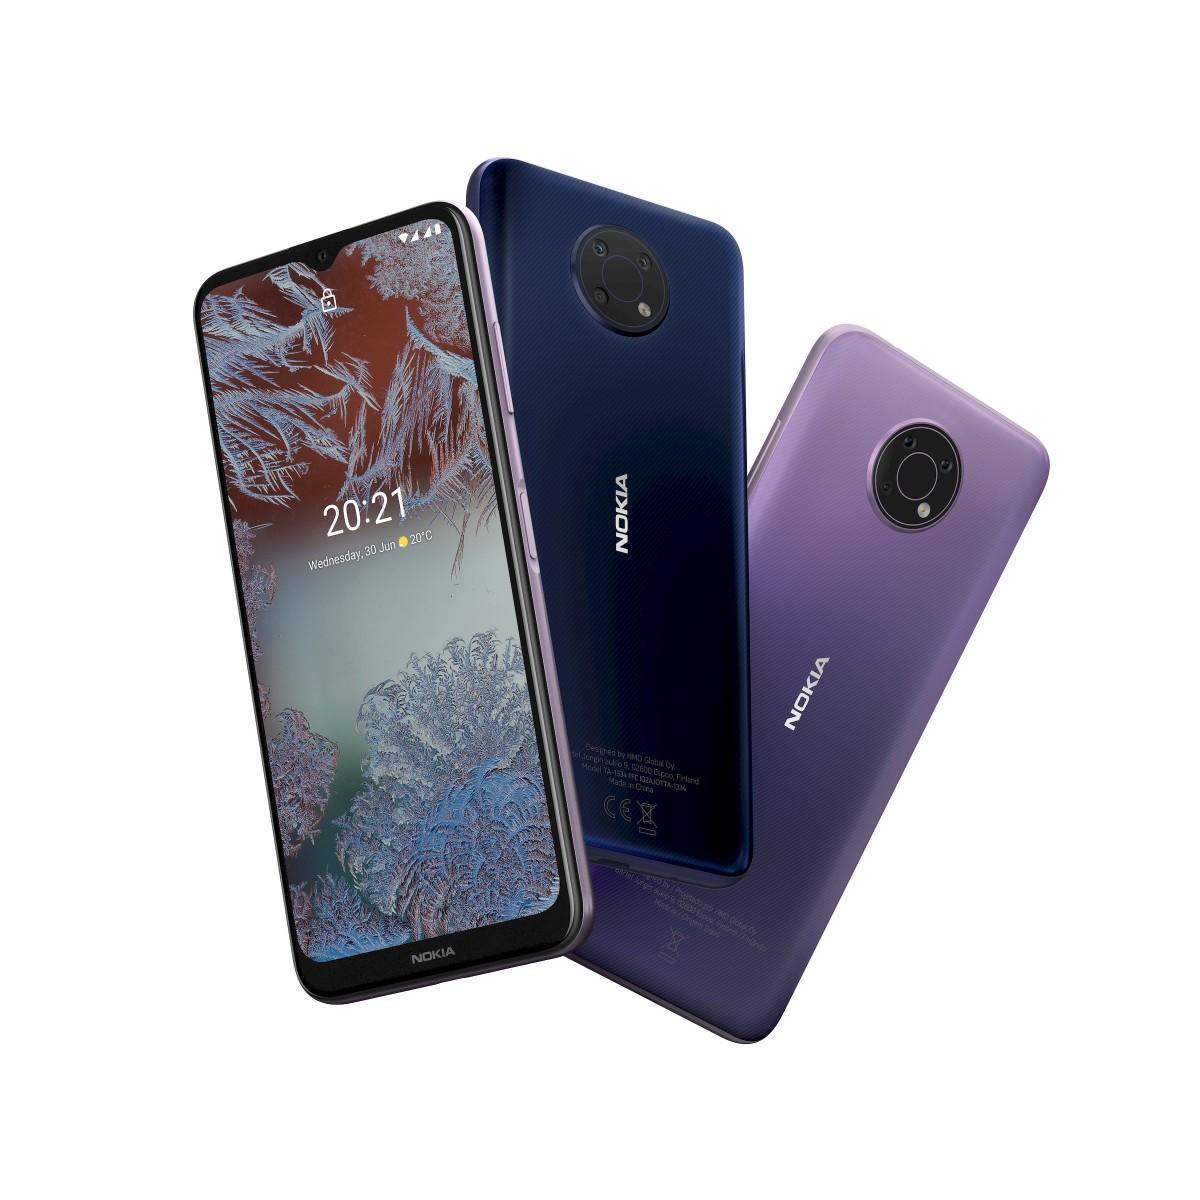 Harga Spesifikasi Nokia G10 Indonesia